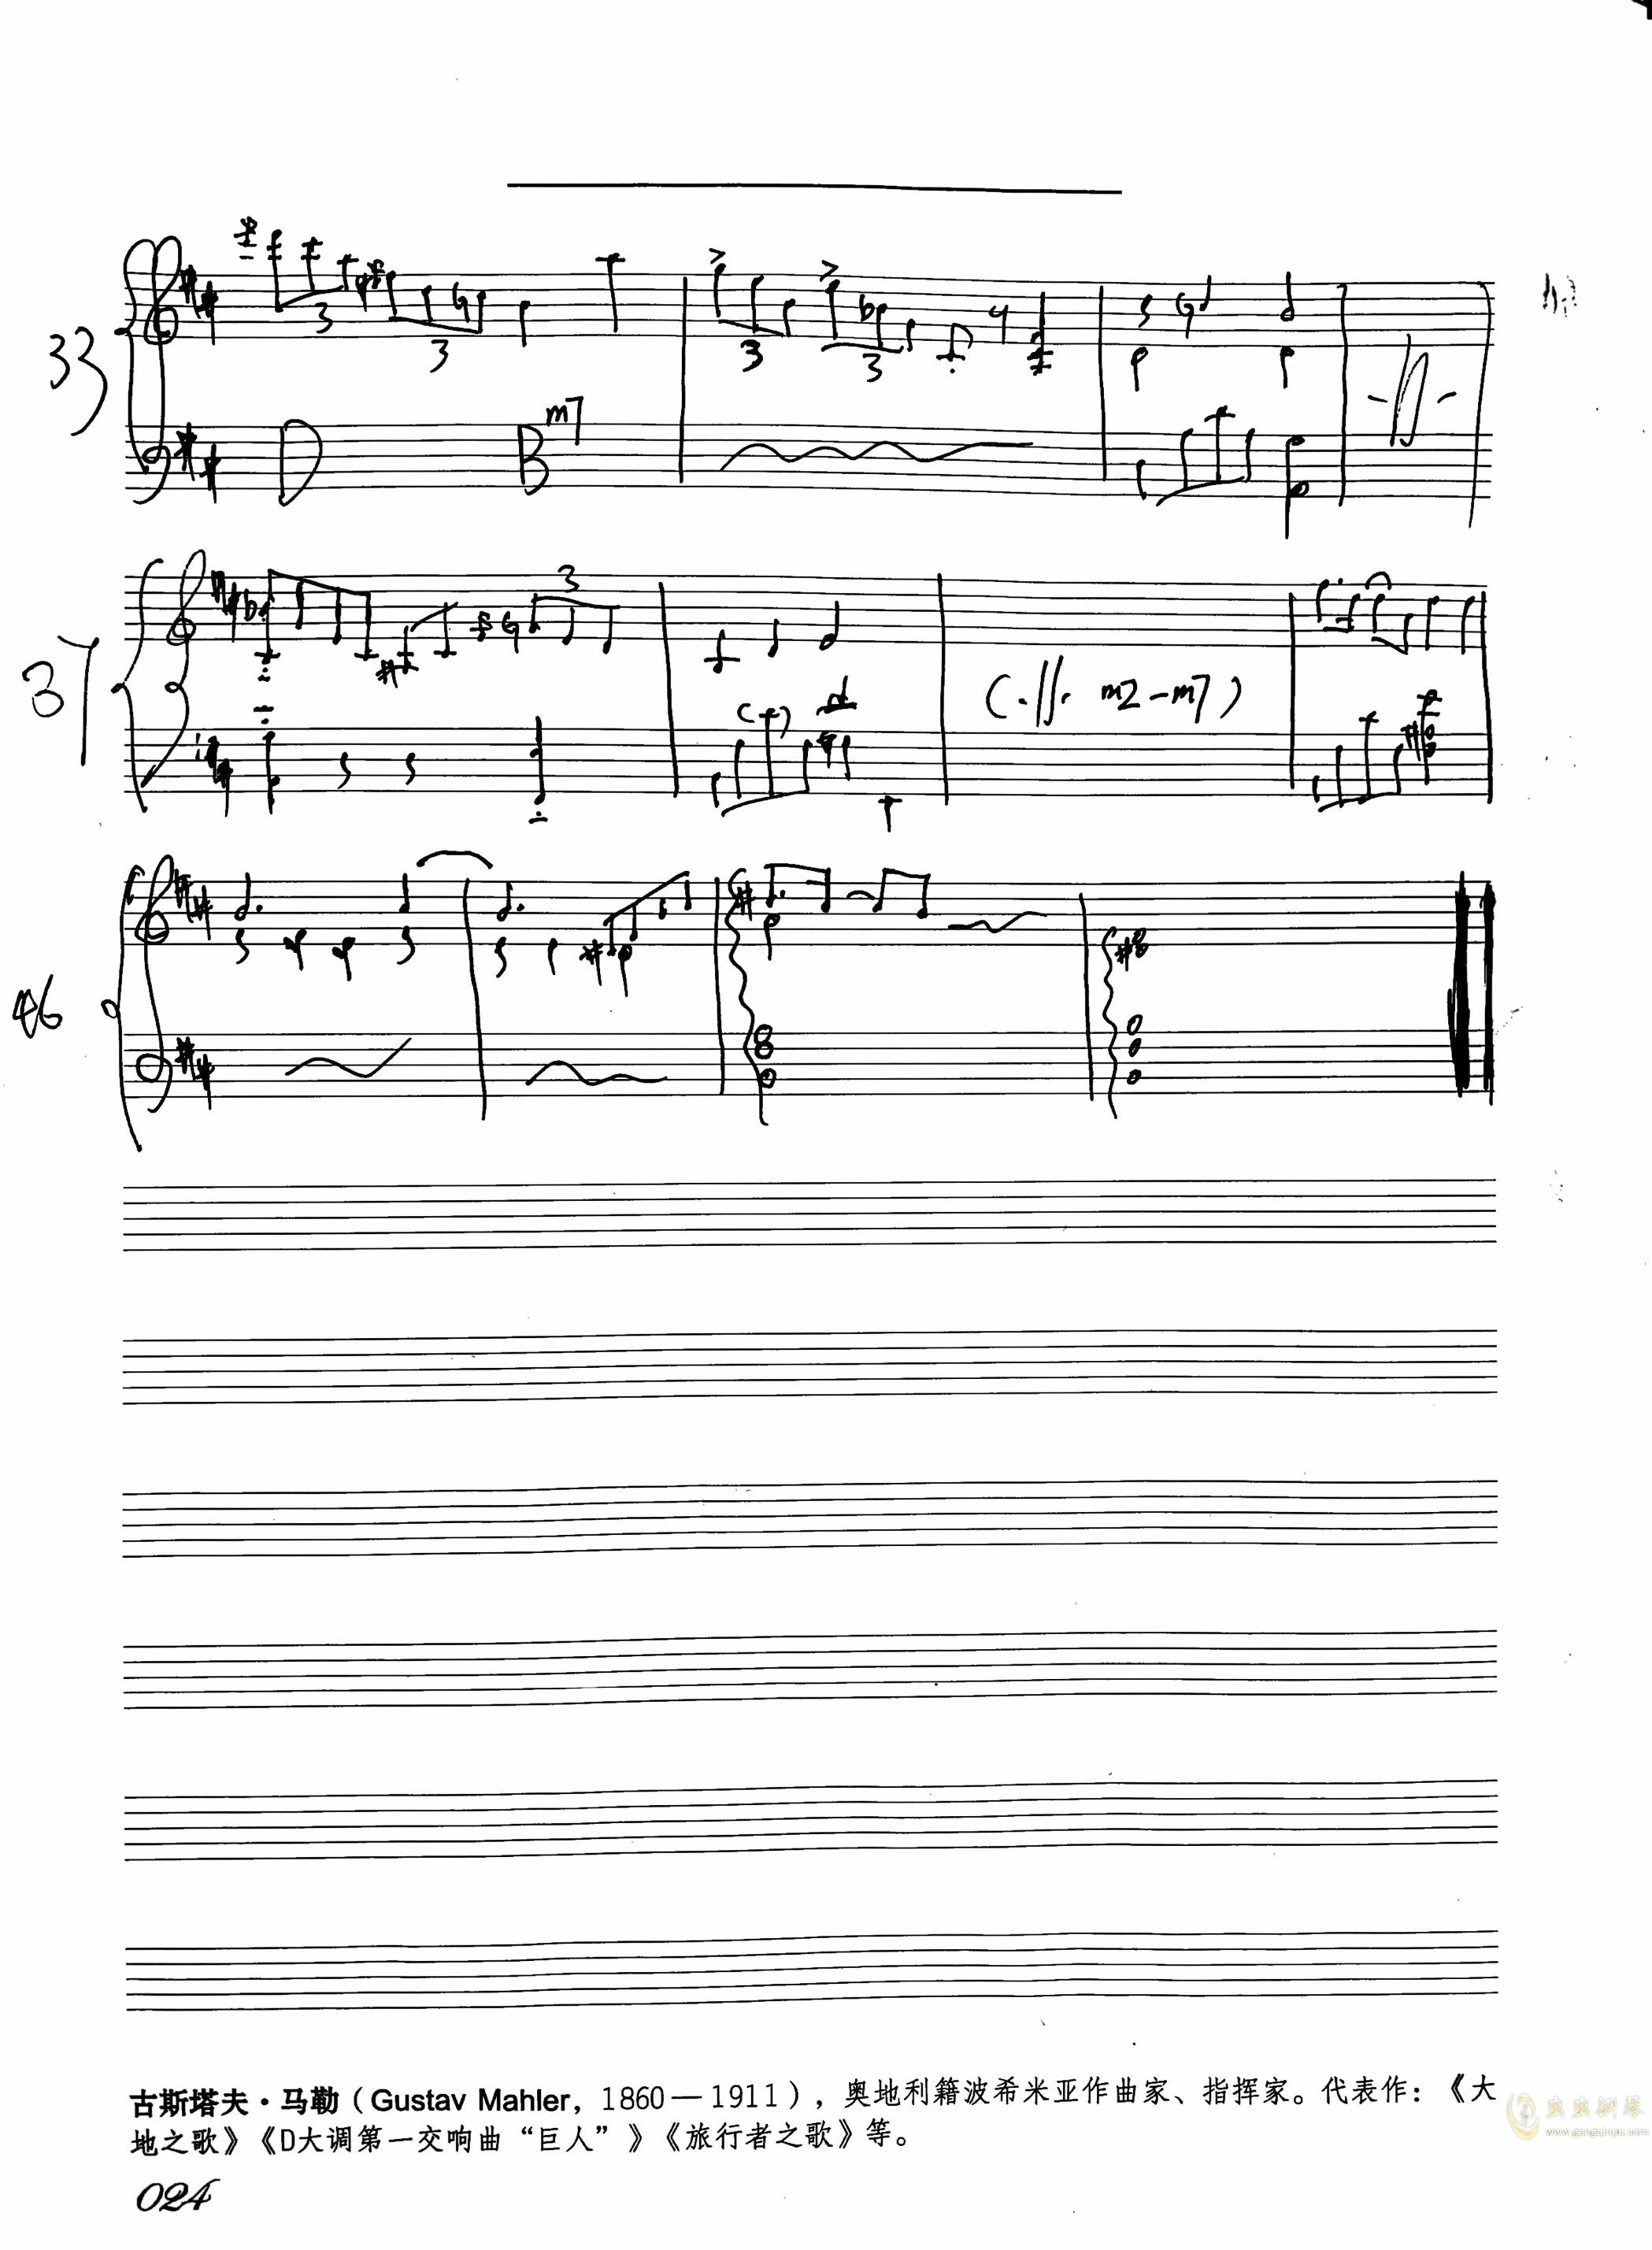 Fantastia in smoothly blues钢琴谱 第2页